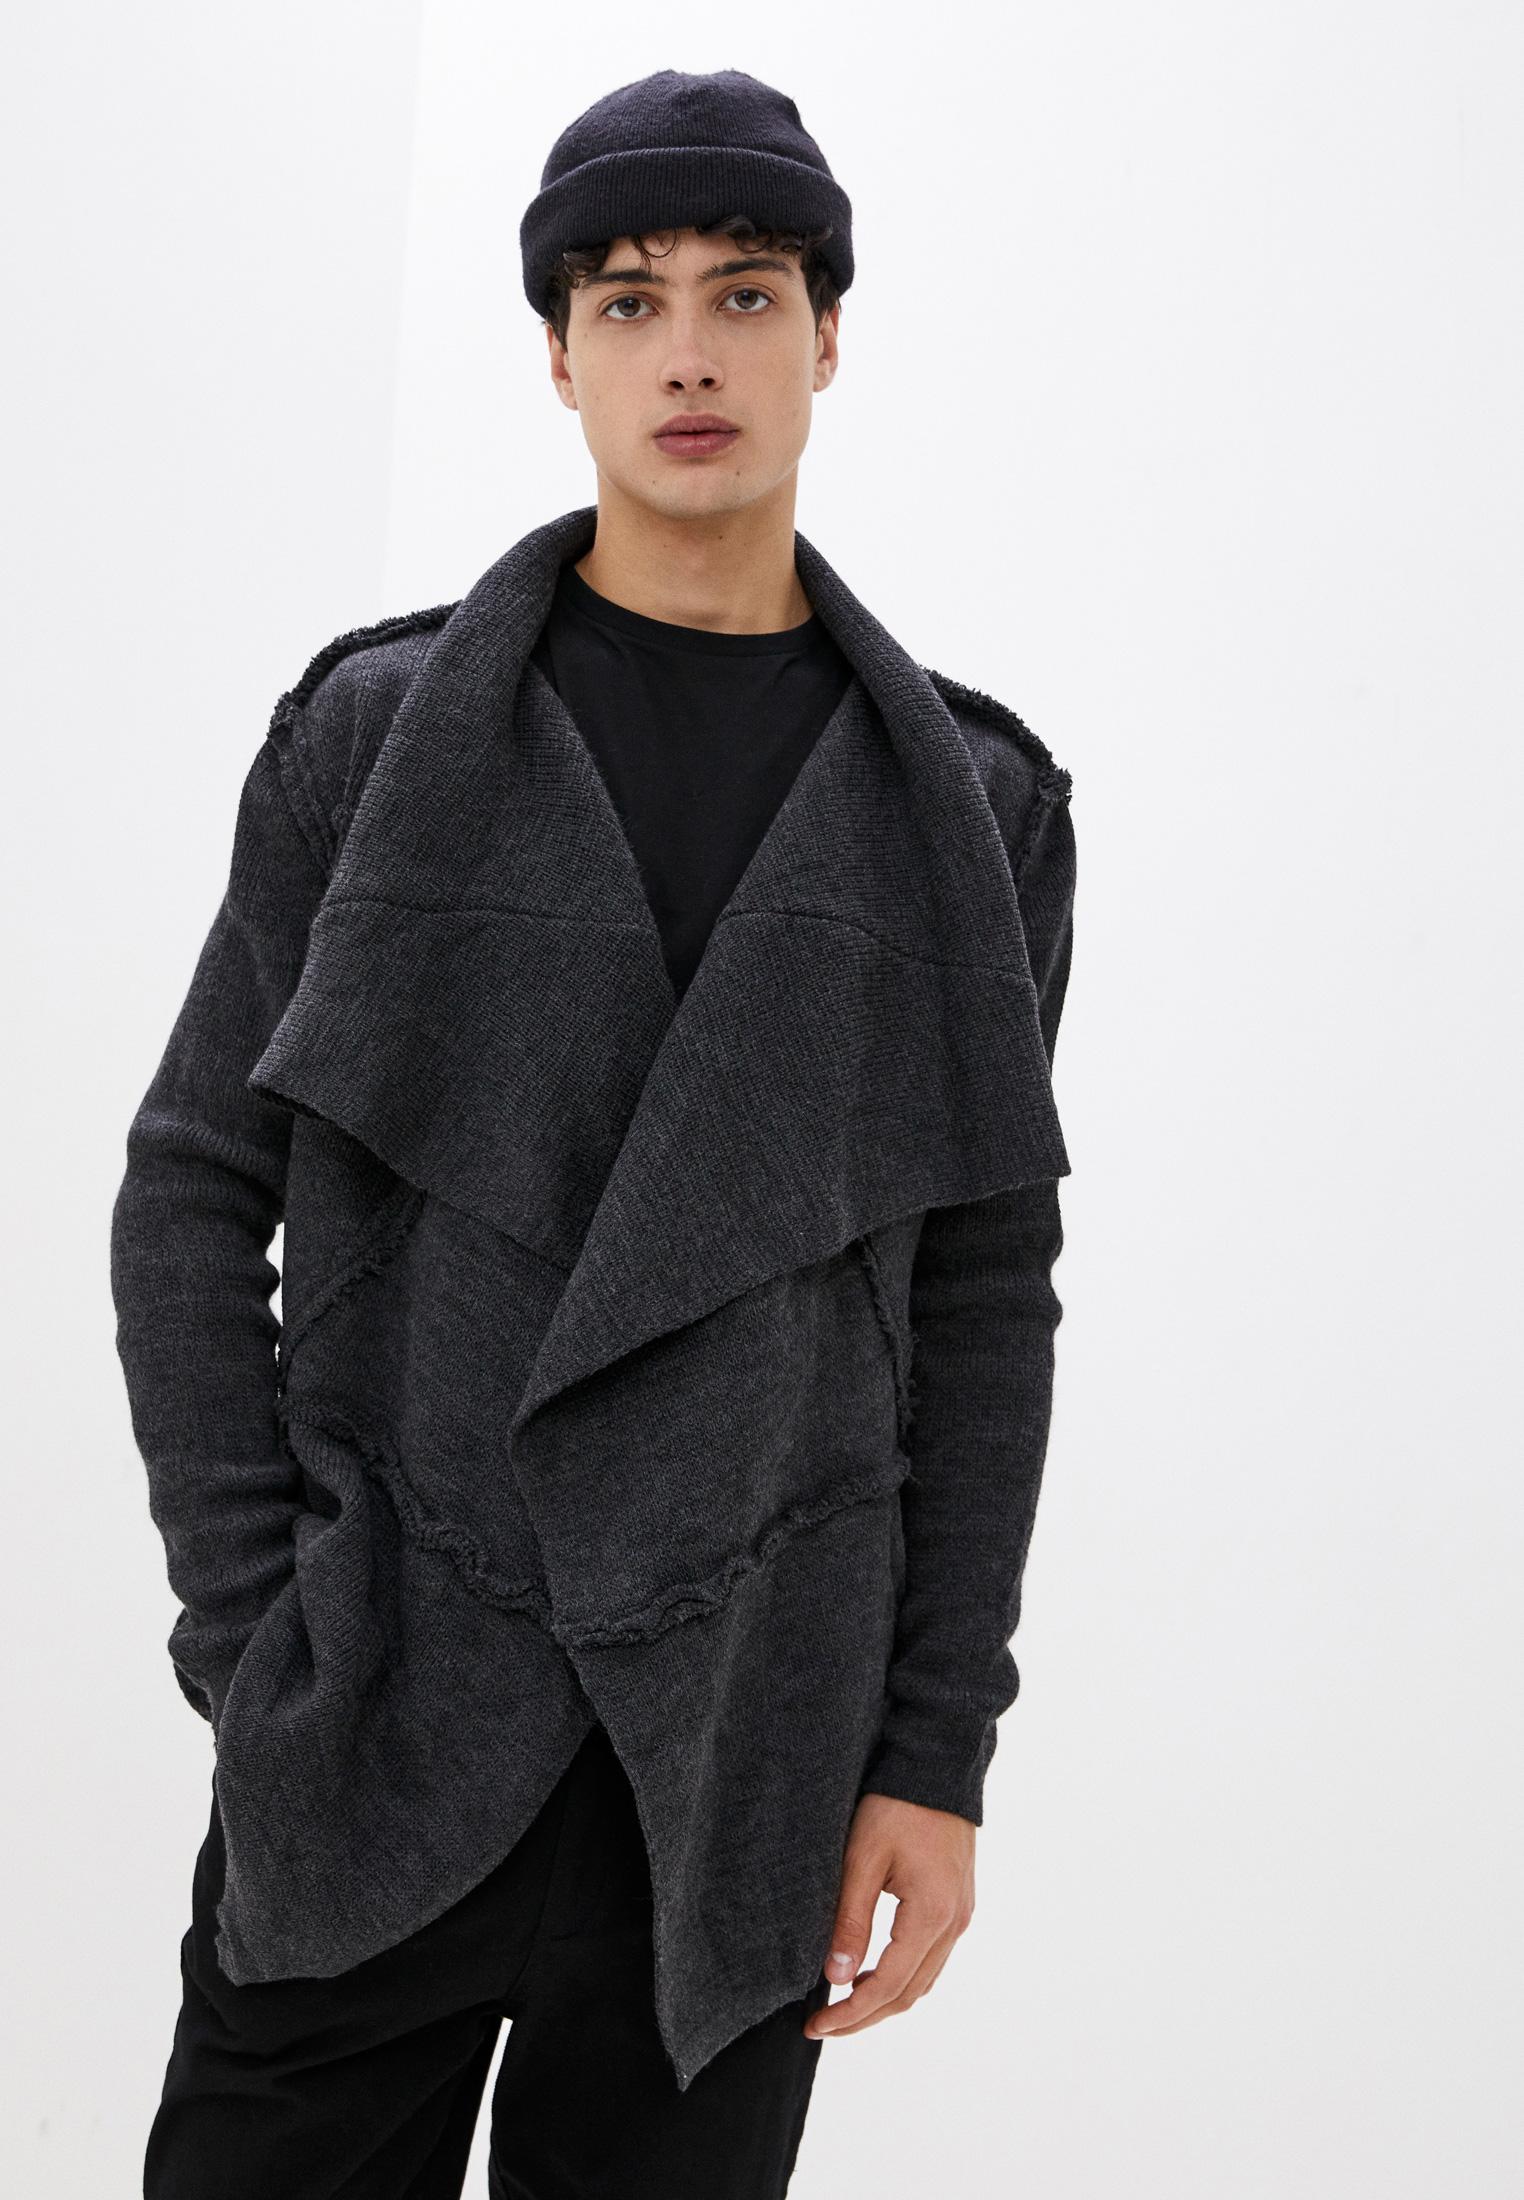 Мужская одежда Dali 3742